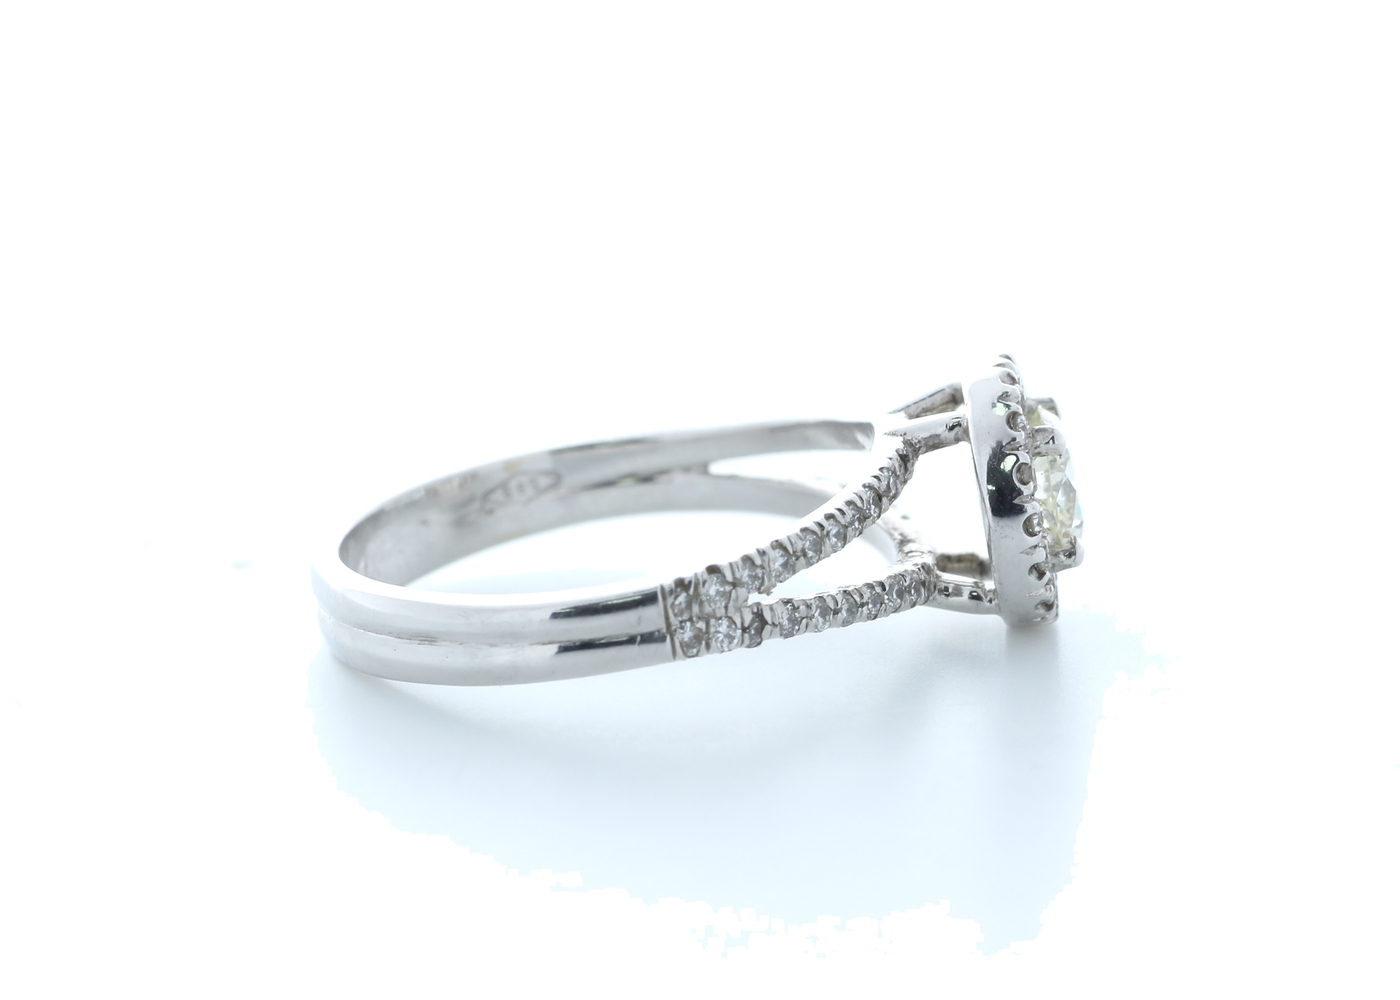 18k White Gold Single Stone With Halo Setting Ring 0.78 (0.45) Carats - Image 4 of 5